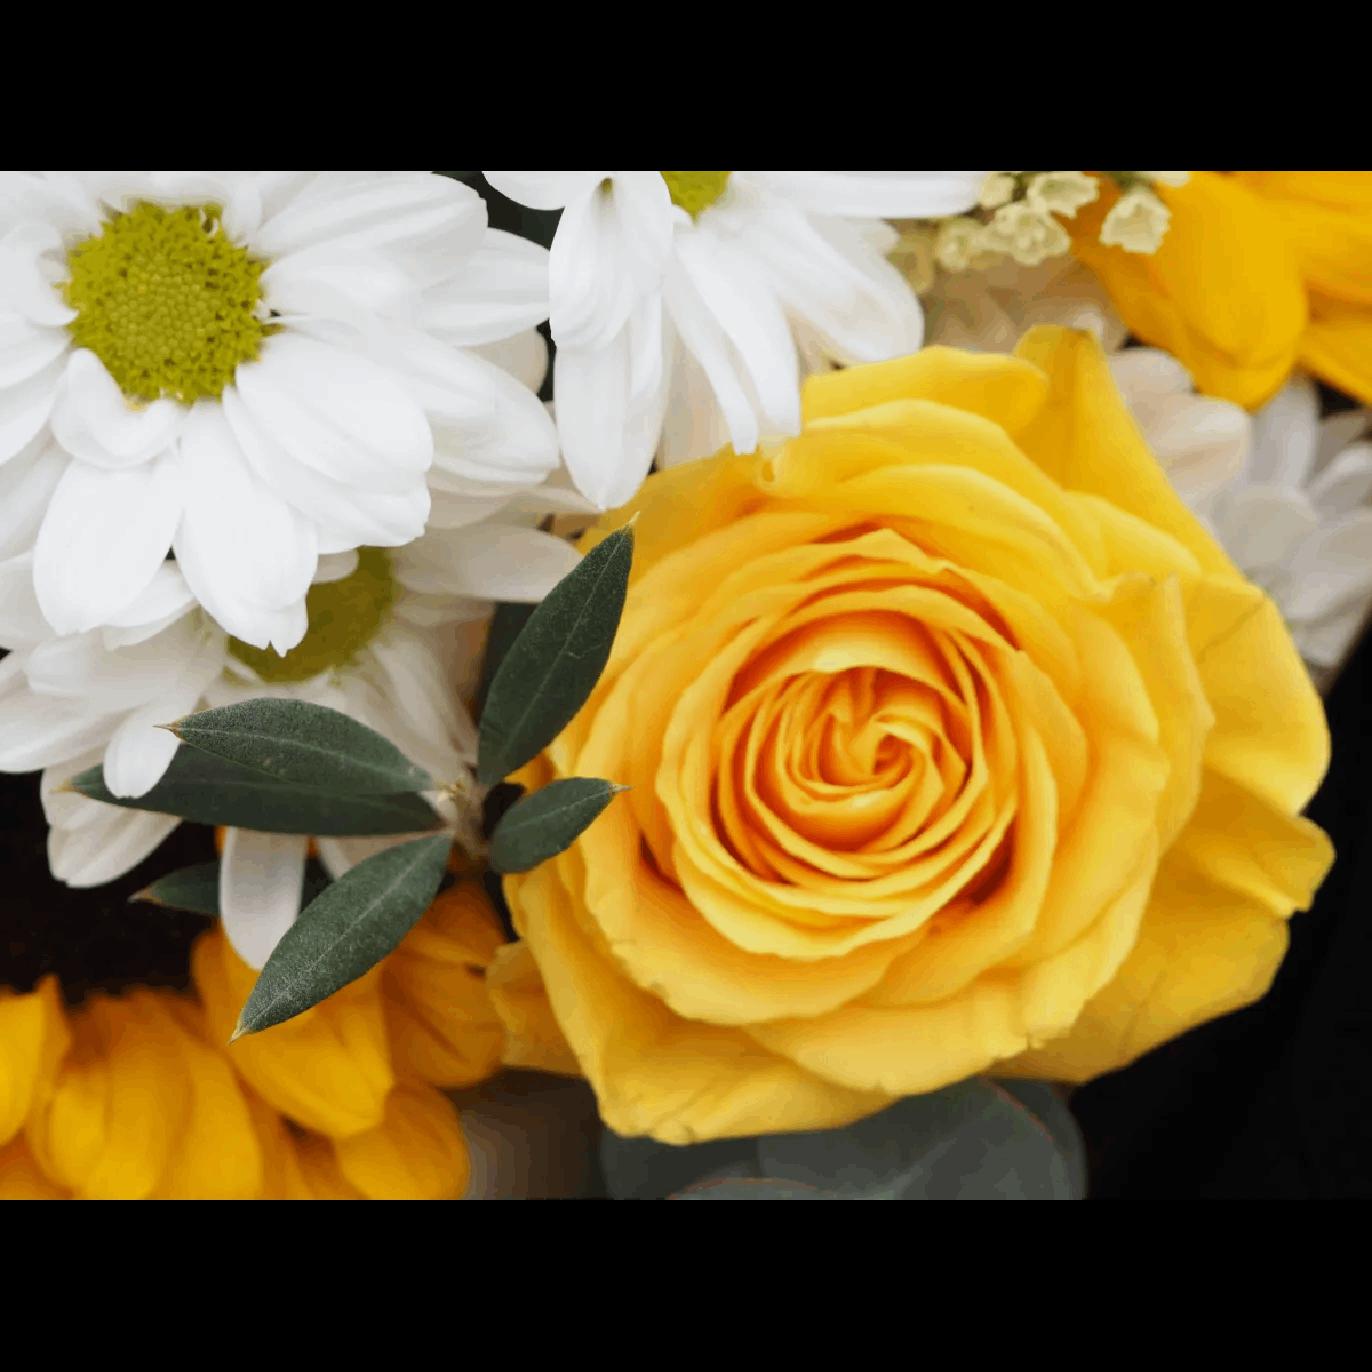 flores rosas amarillas margaritas girasoles